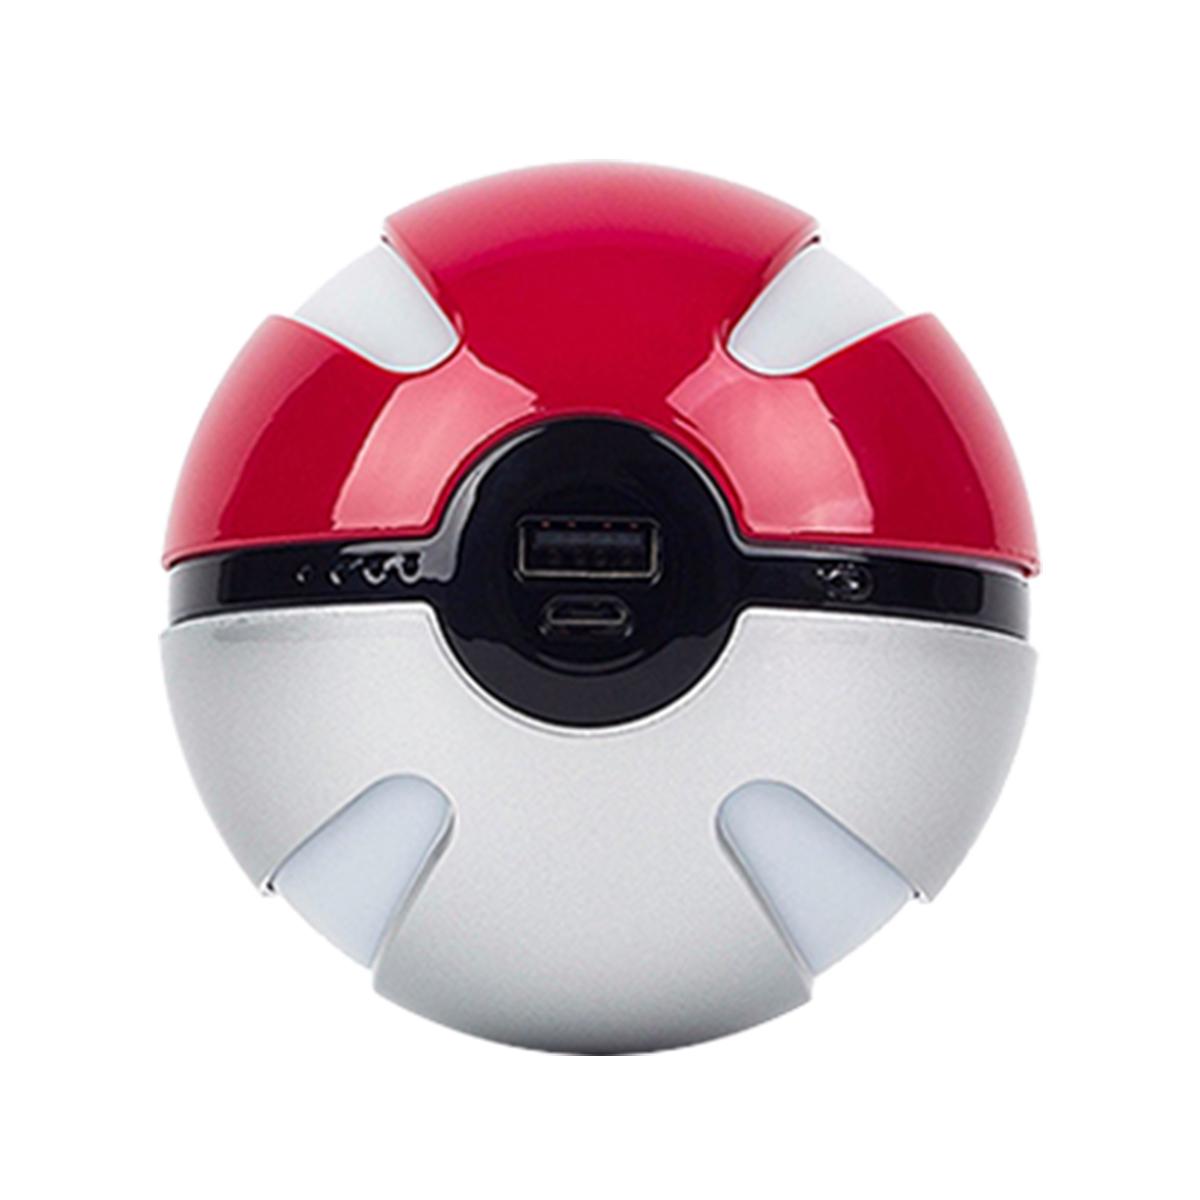 WE Power Bank 7200mAh 1.5A Li-Ion Magic ball